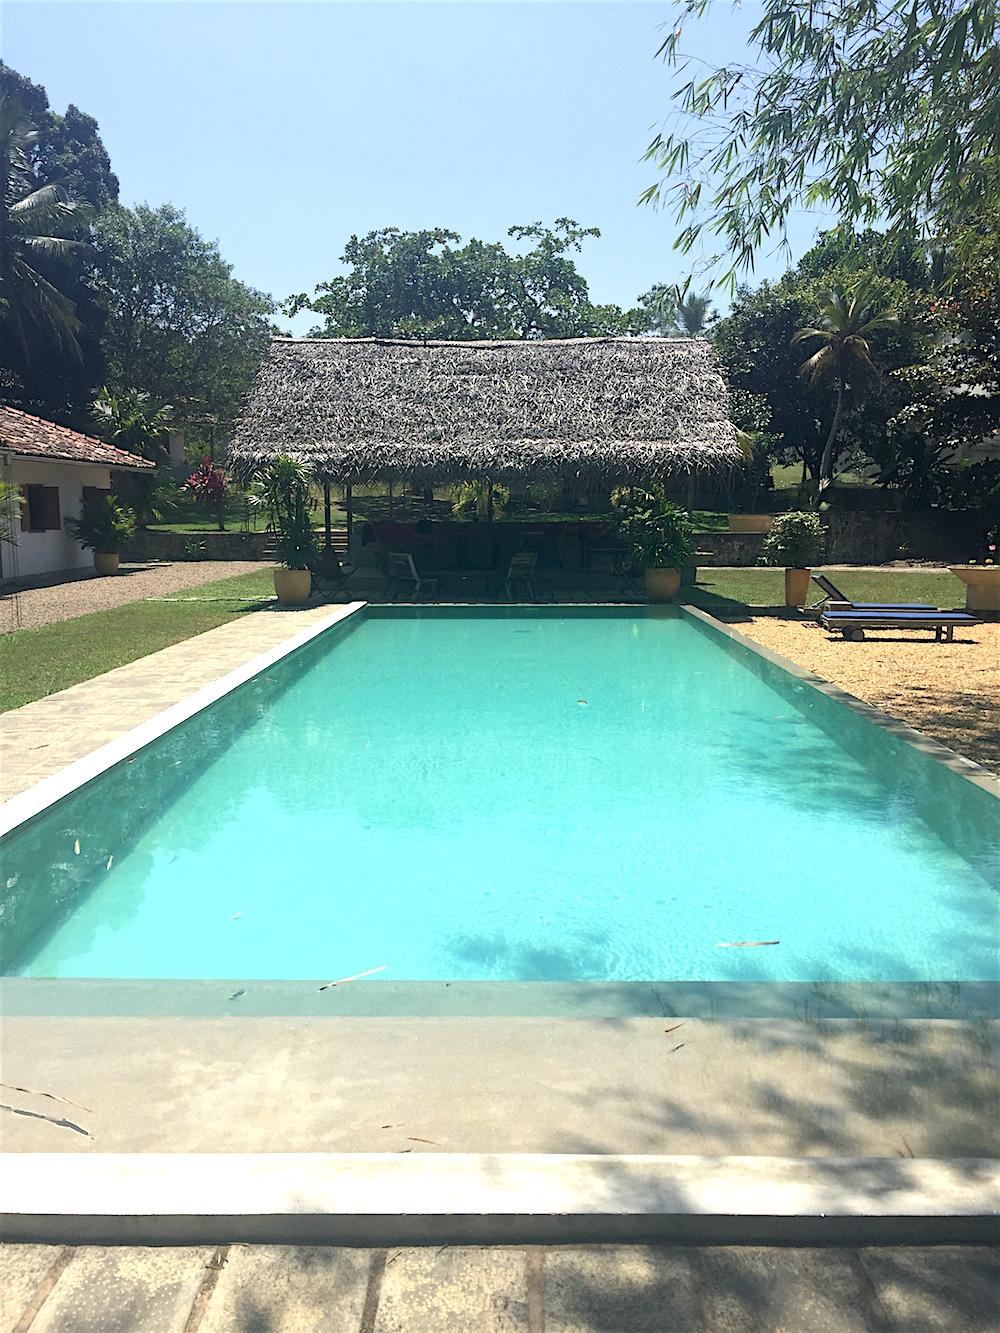 Sri-Lanka-Yoga-Retreat-Ali-Gilling-14.JPG